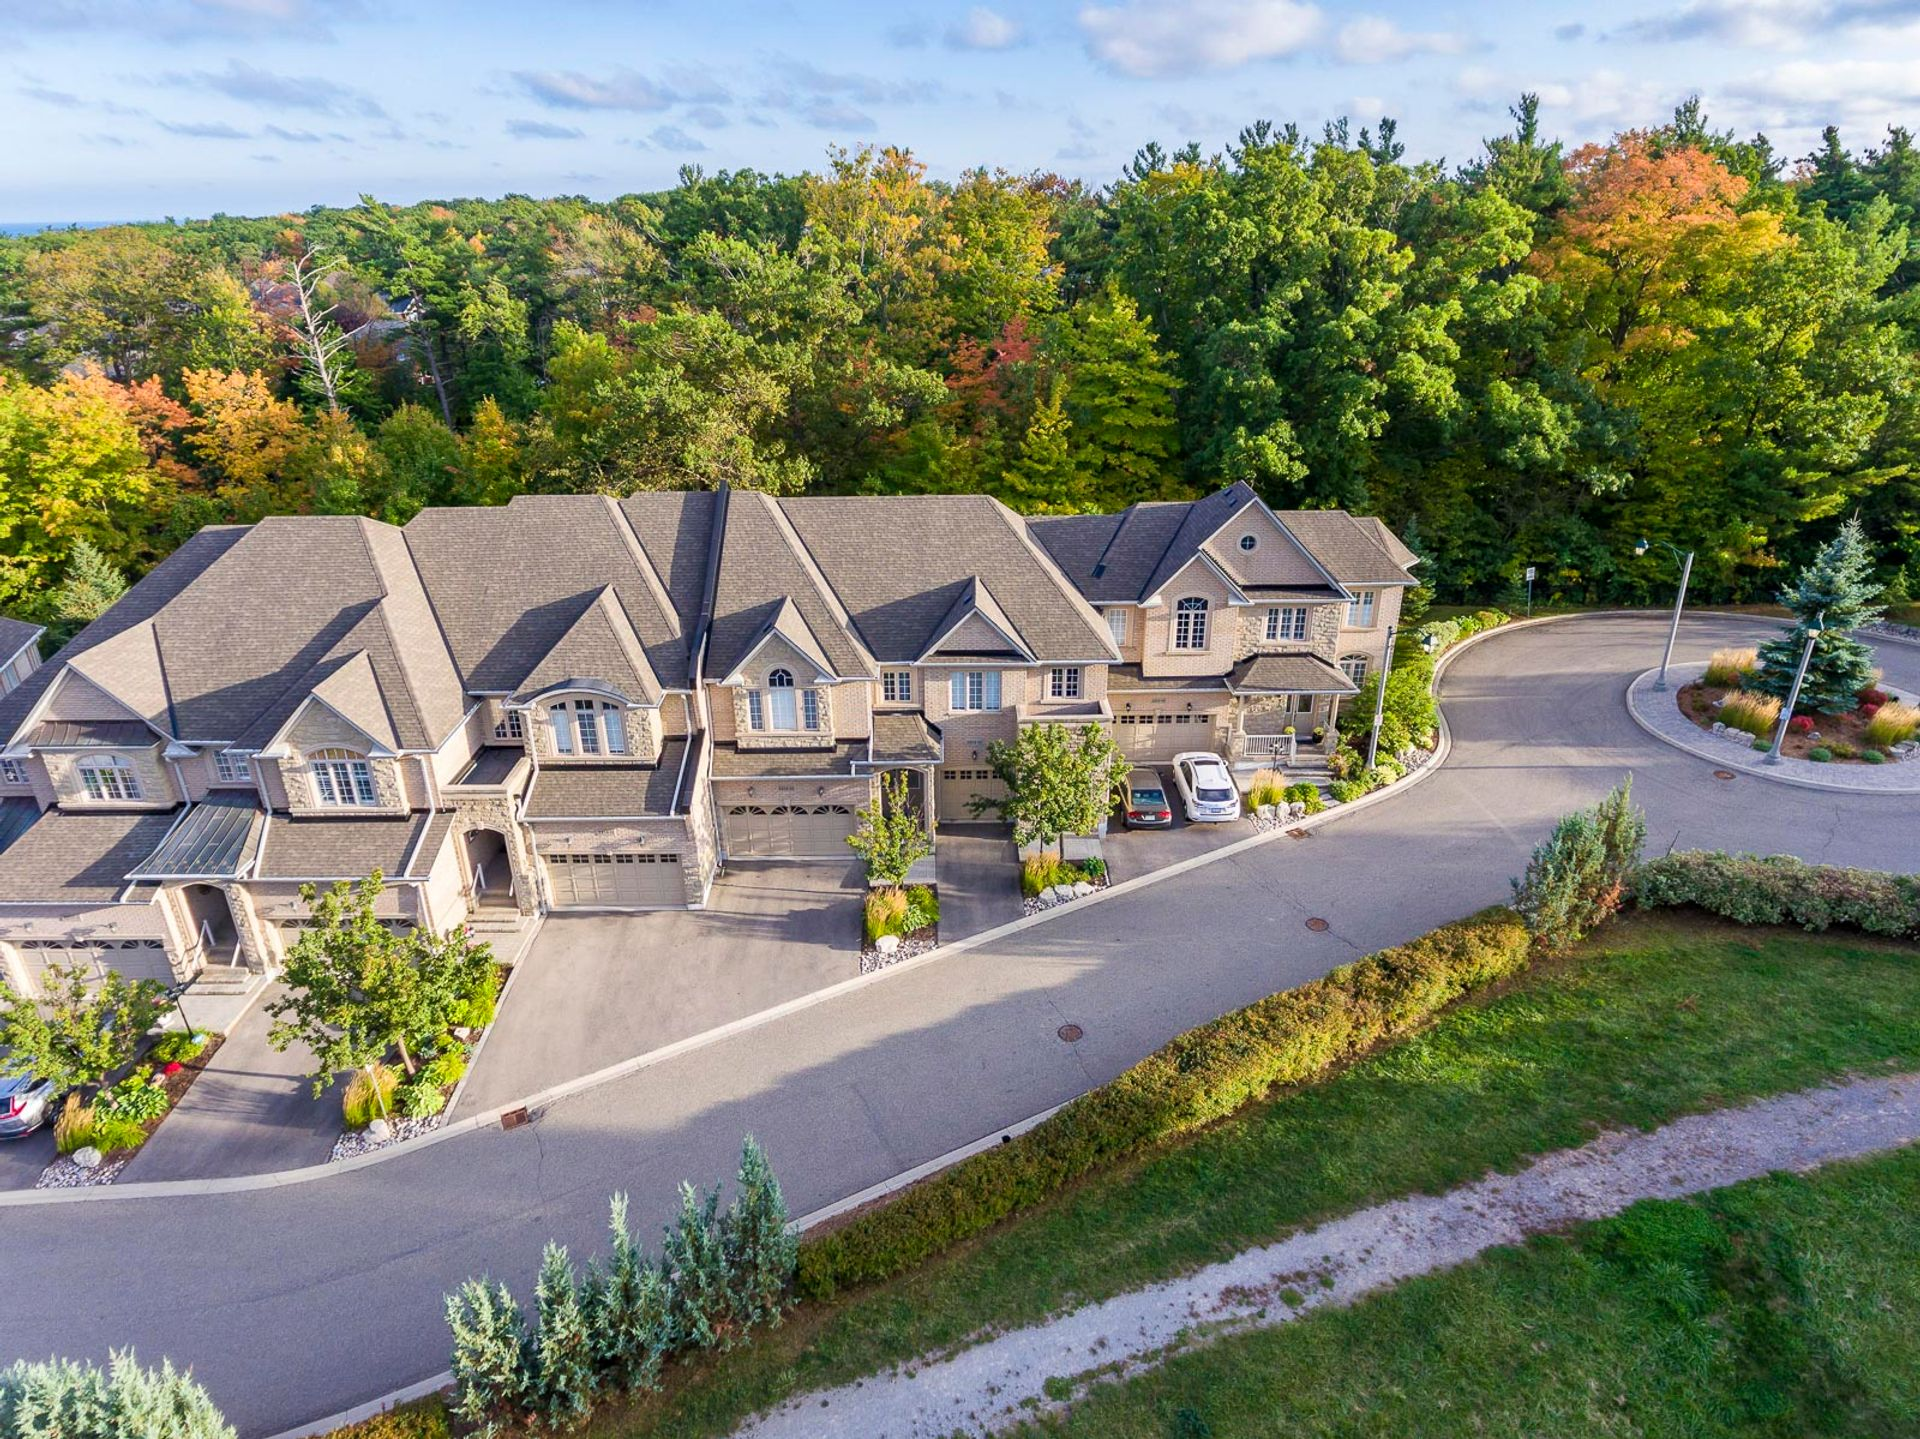 Location - 12-2254 Rockingham Dr, Oakville at 12 - 2254 Rockingham Drive, Iroquois Ridge North, Oakville